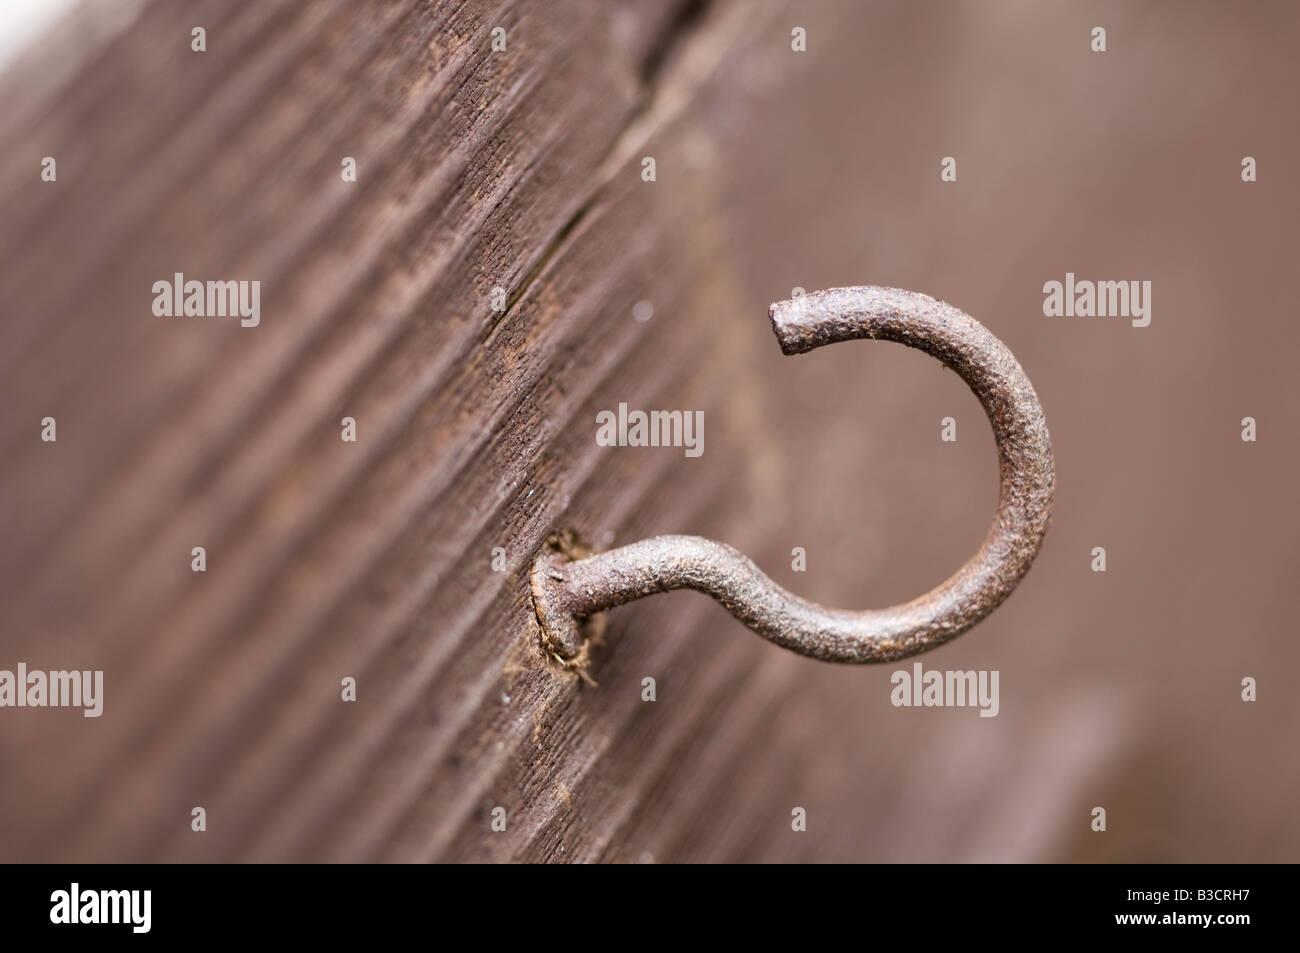 Rusty hook screwed into wood - Stock Image